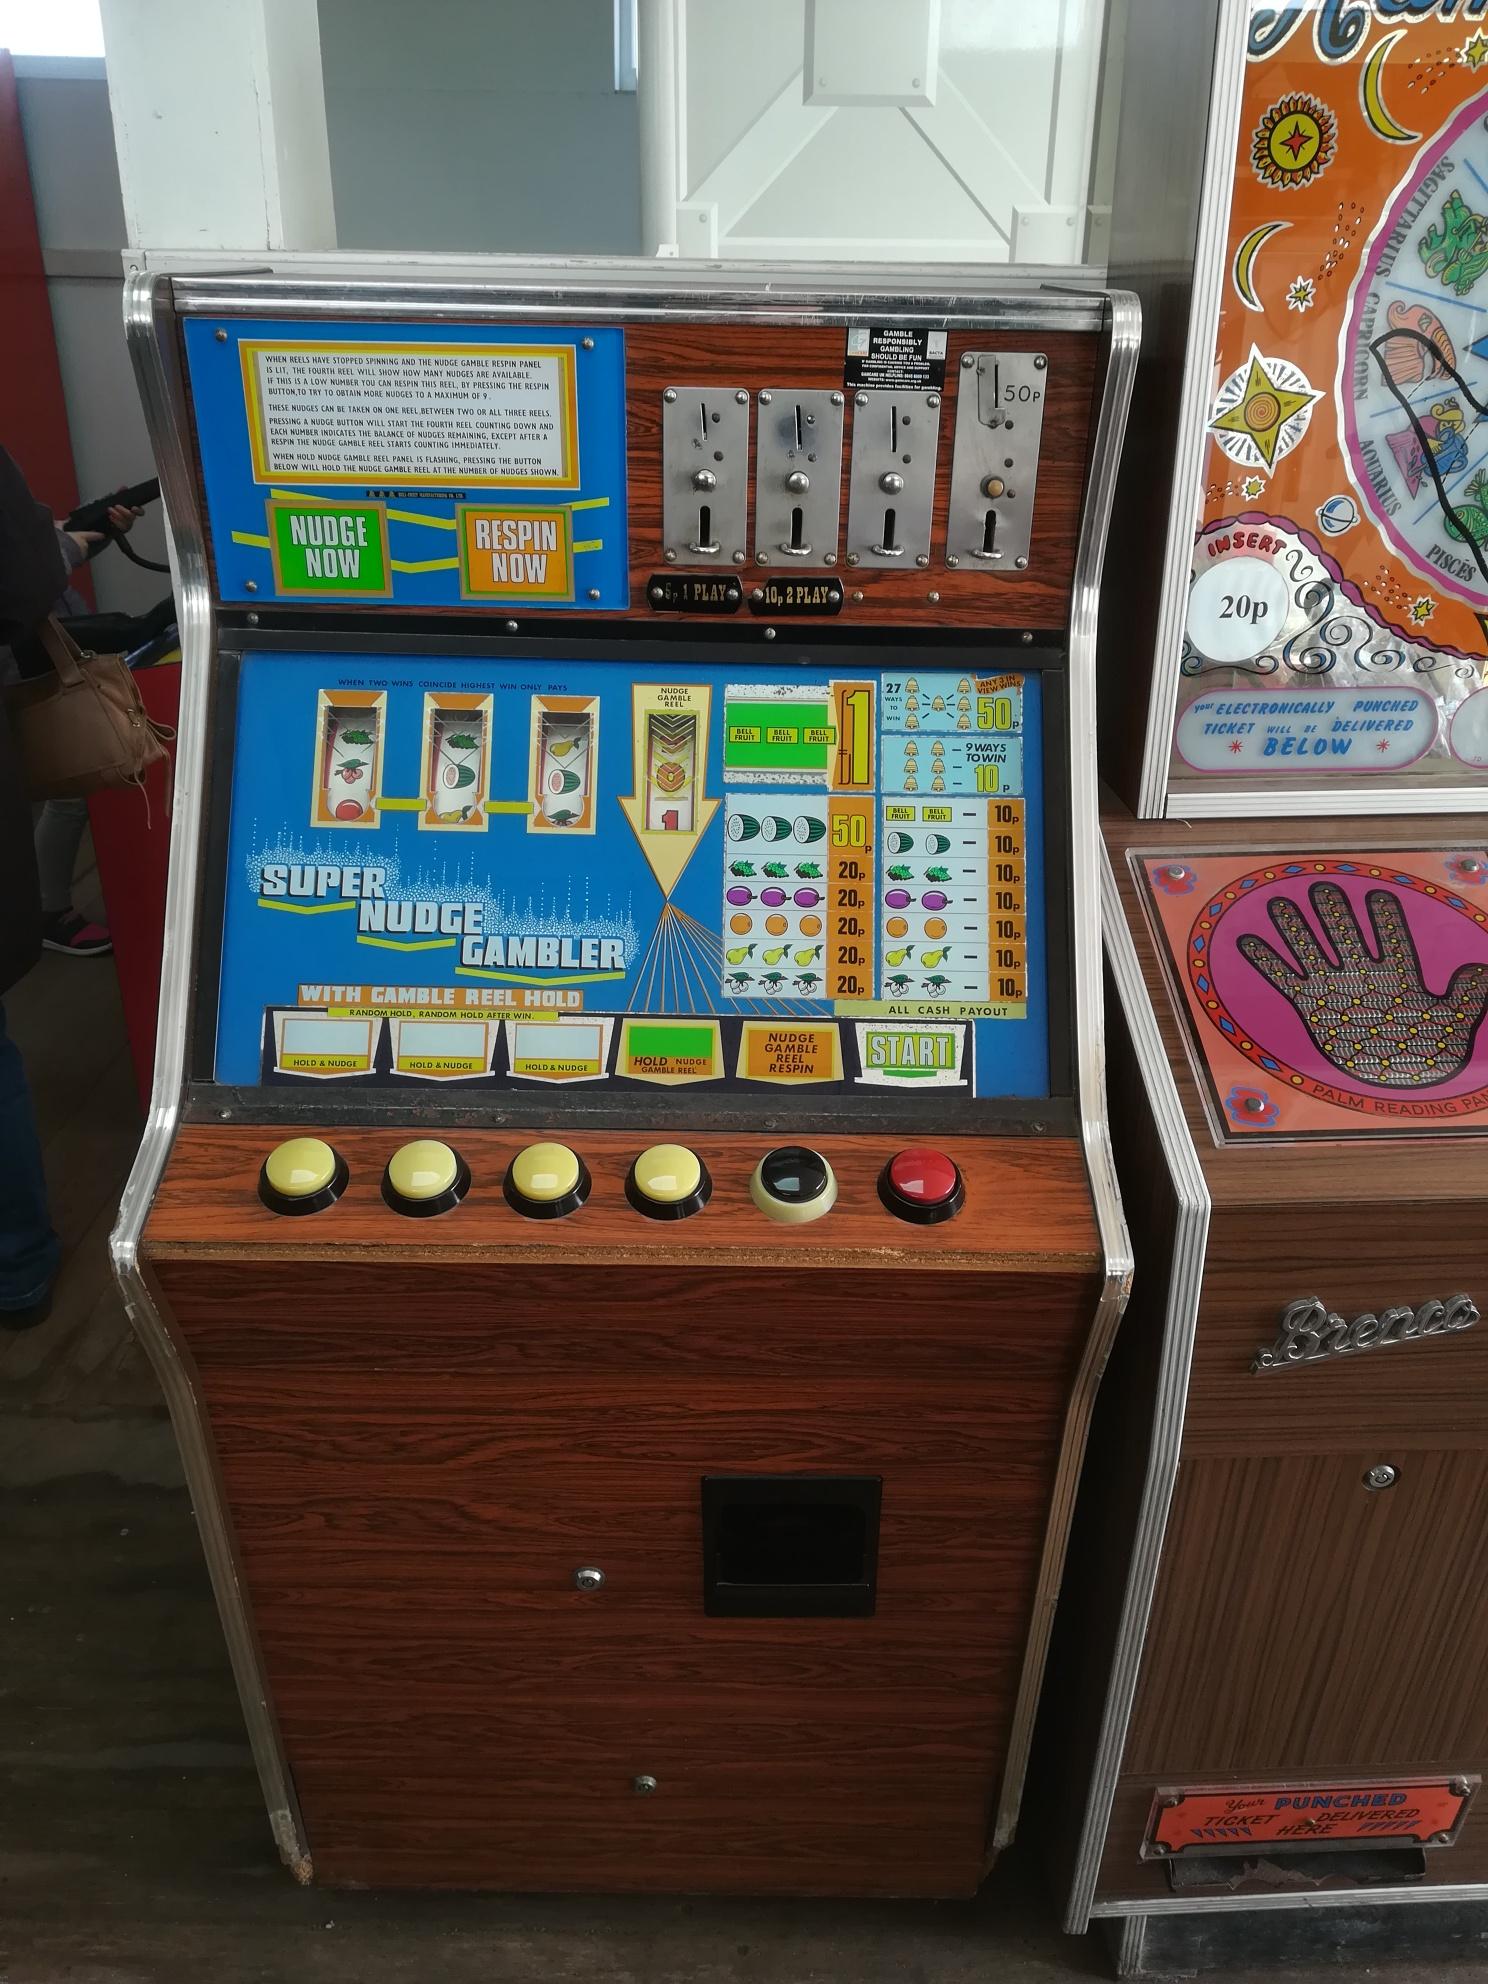 I love the woodgrain on this Super Nudge Gambler machine.